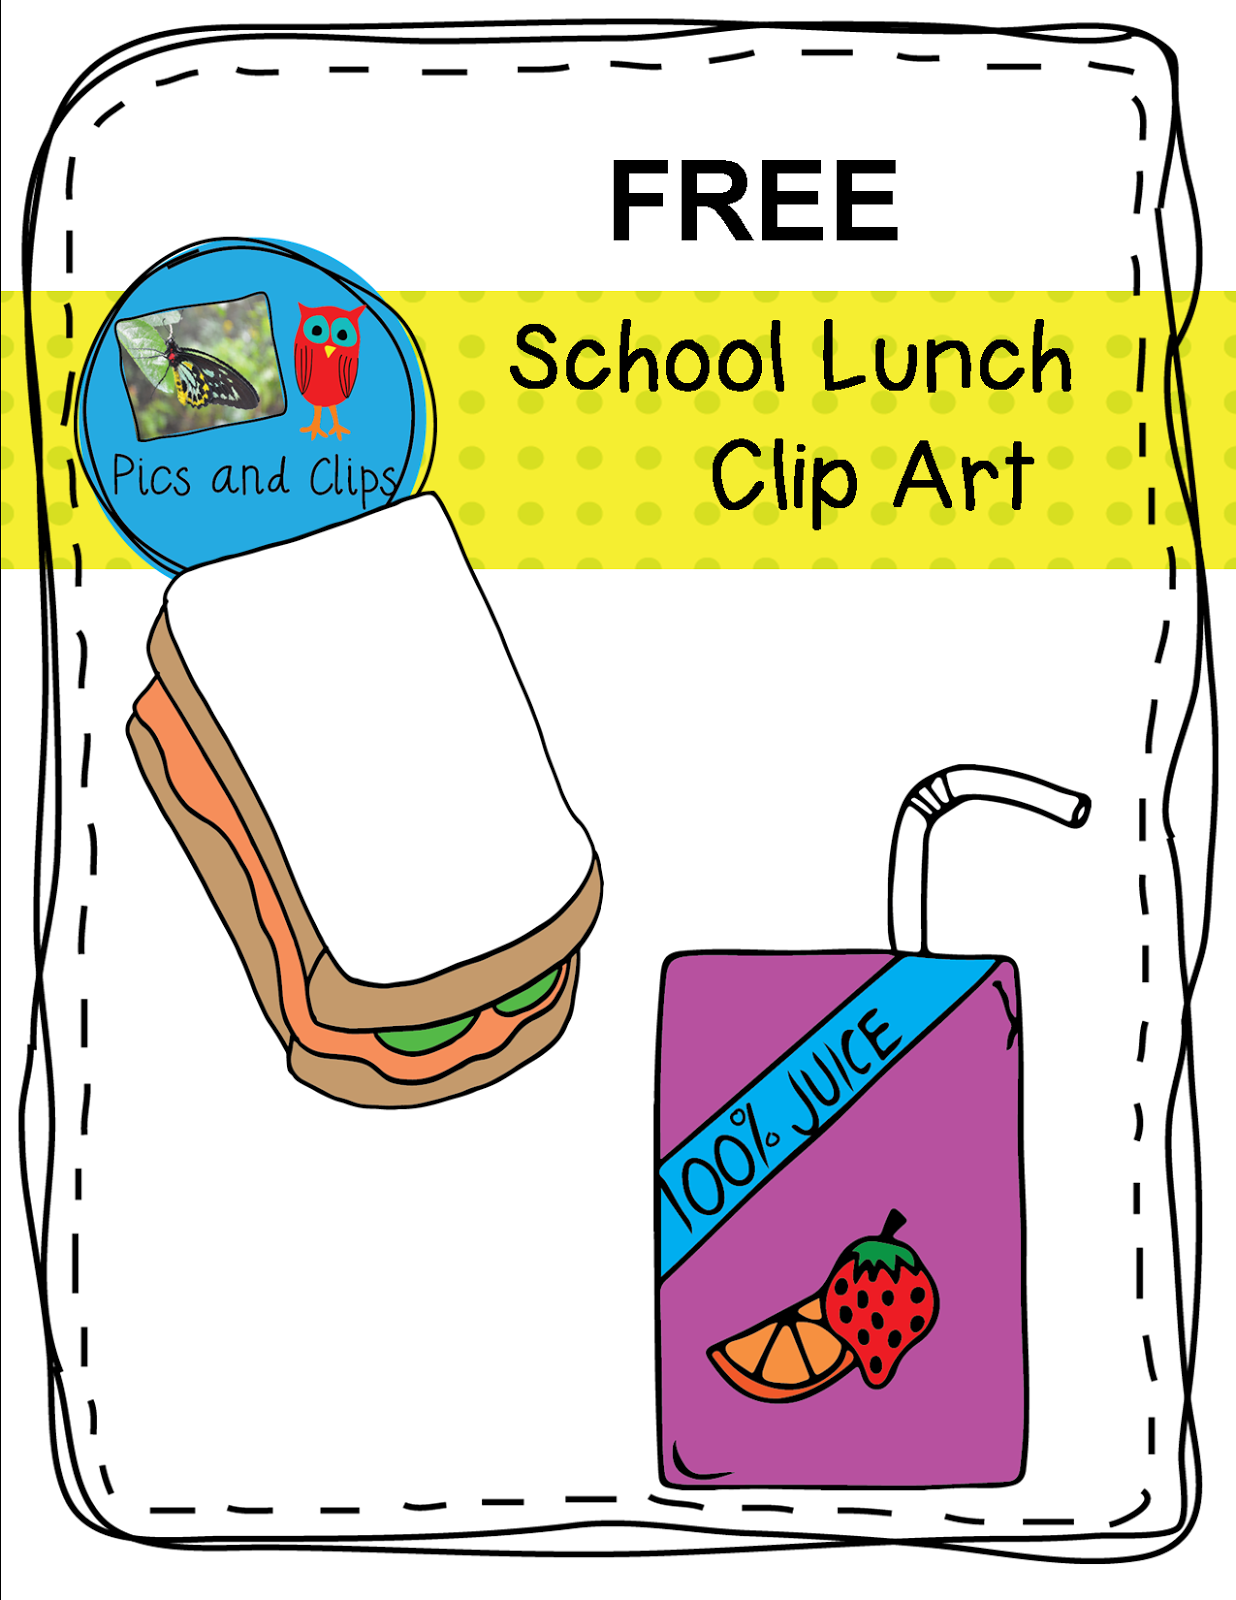 Cafeteria clipart teacher. Free school lunch clip